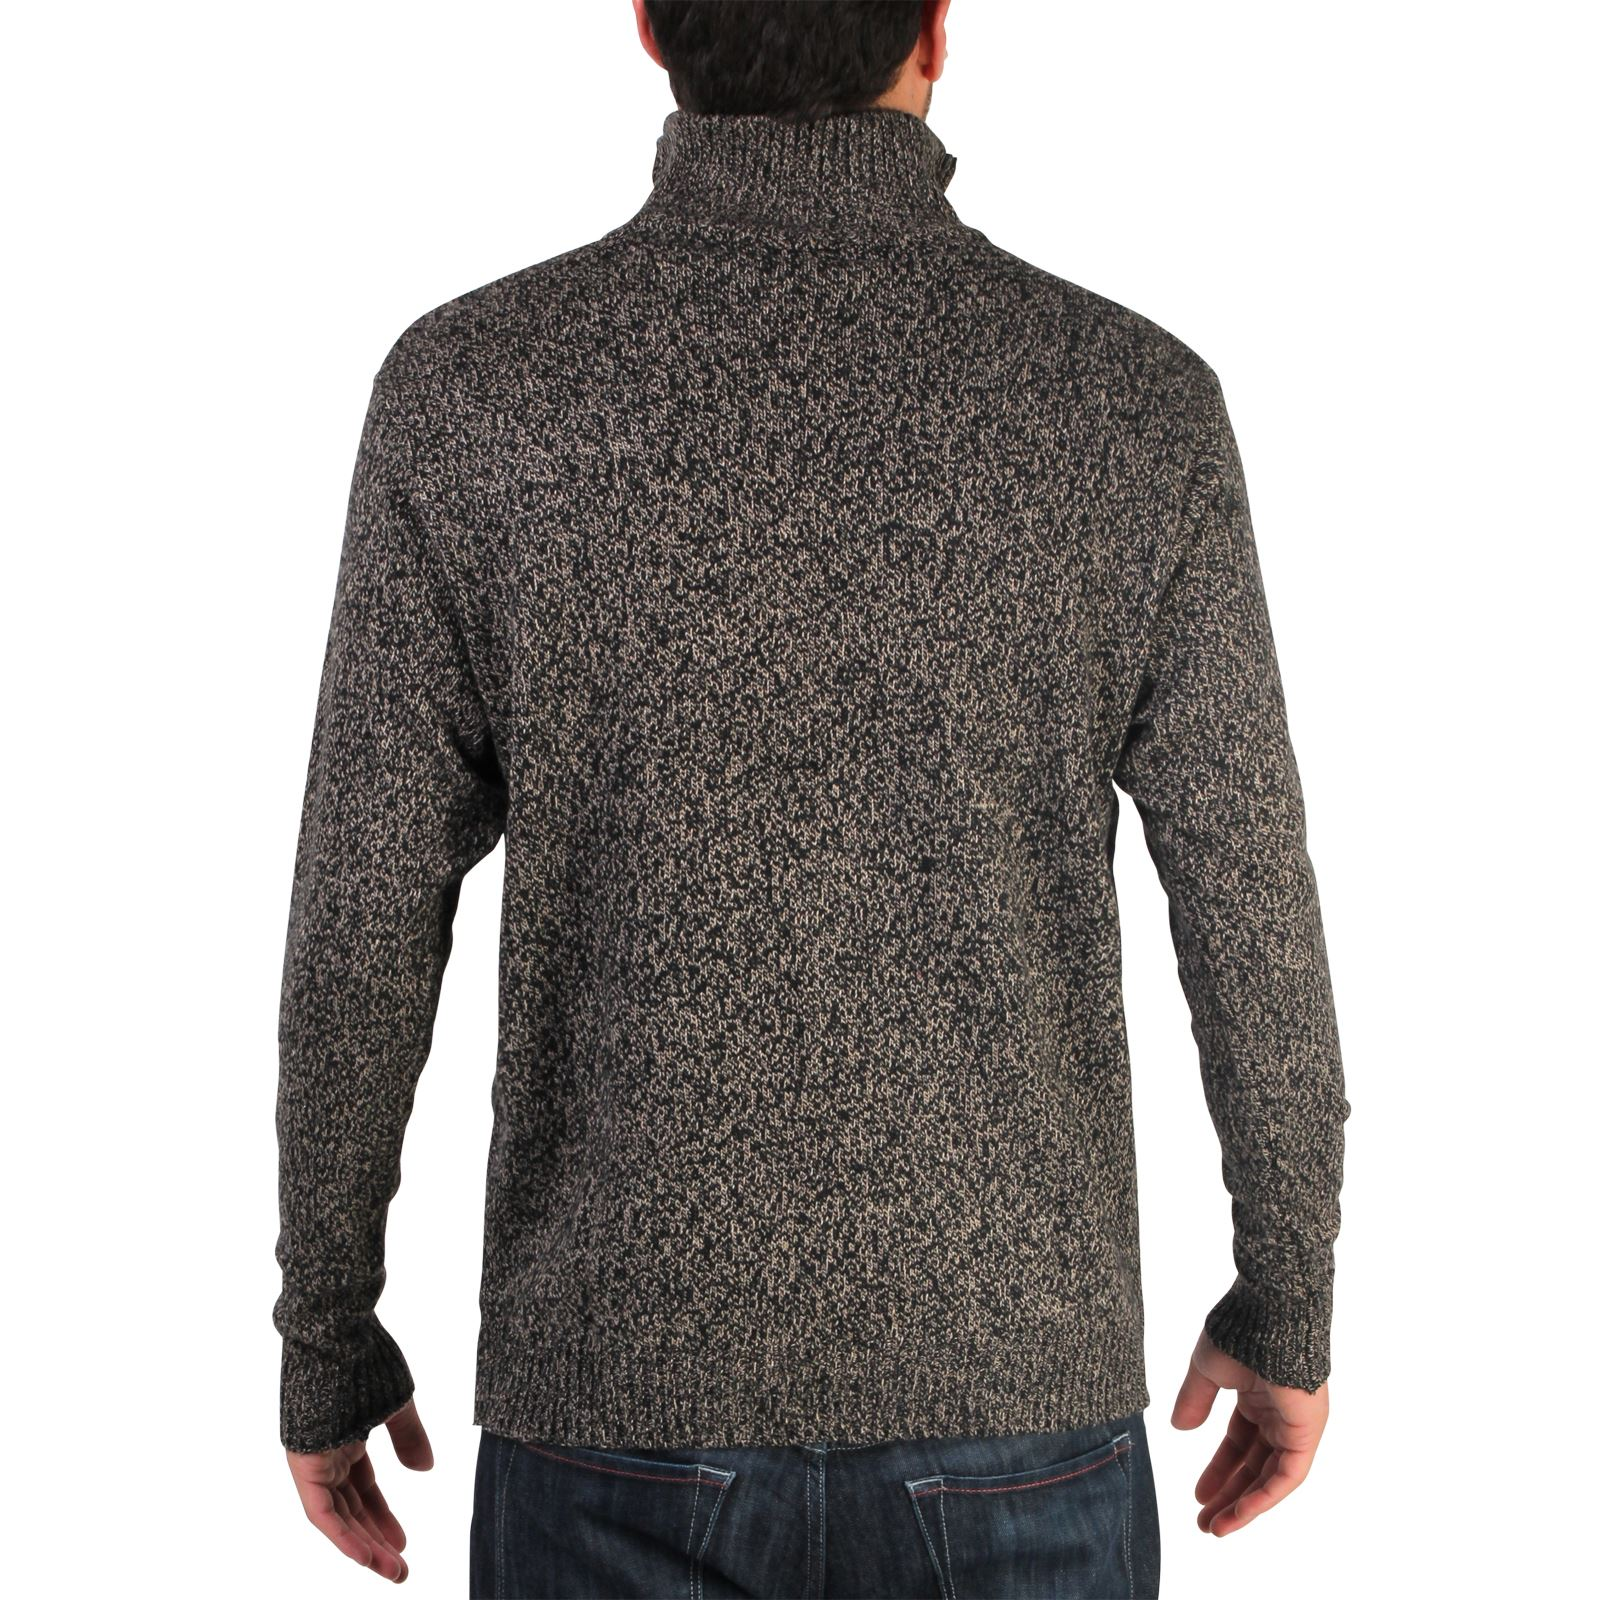 Mens-Soft-Wool-Knit-Half-Zip-Funnel-Neck-Jumper-Sweater-Top-Grandad-Pullover-Top thumbnail 5